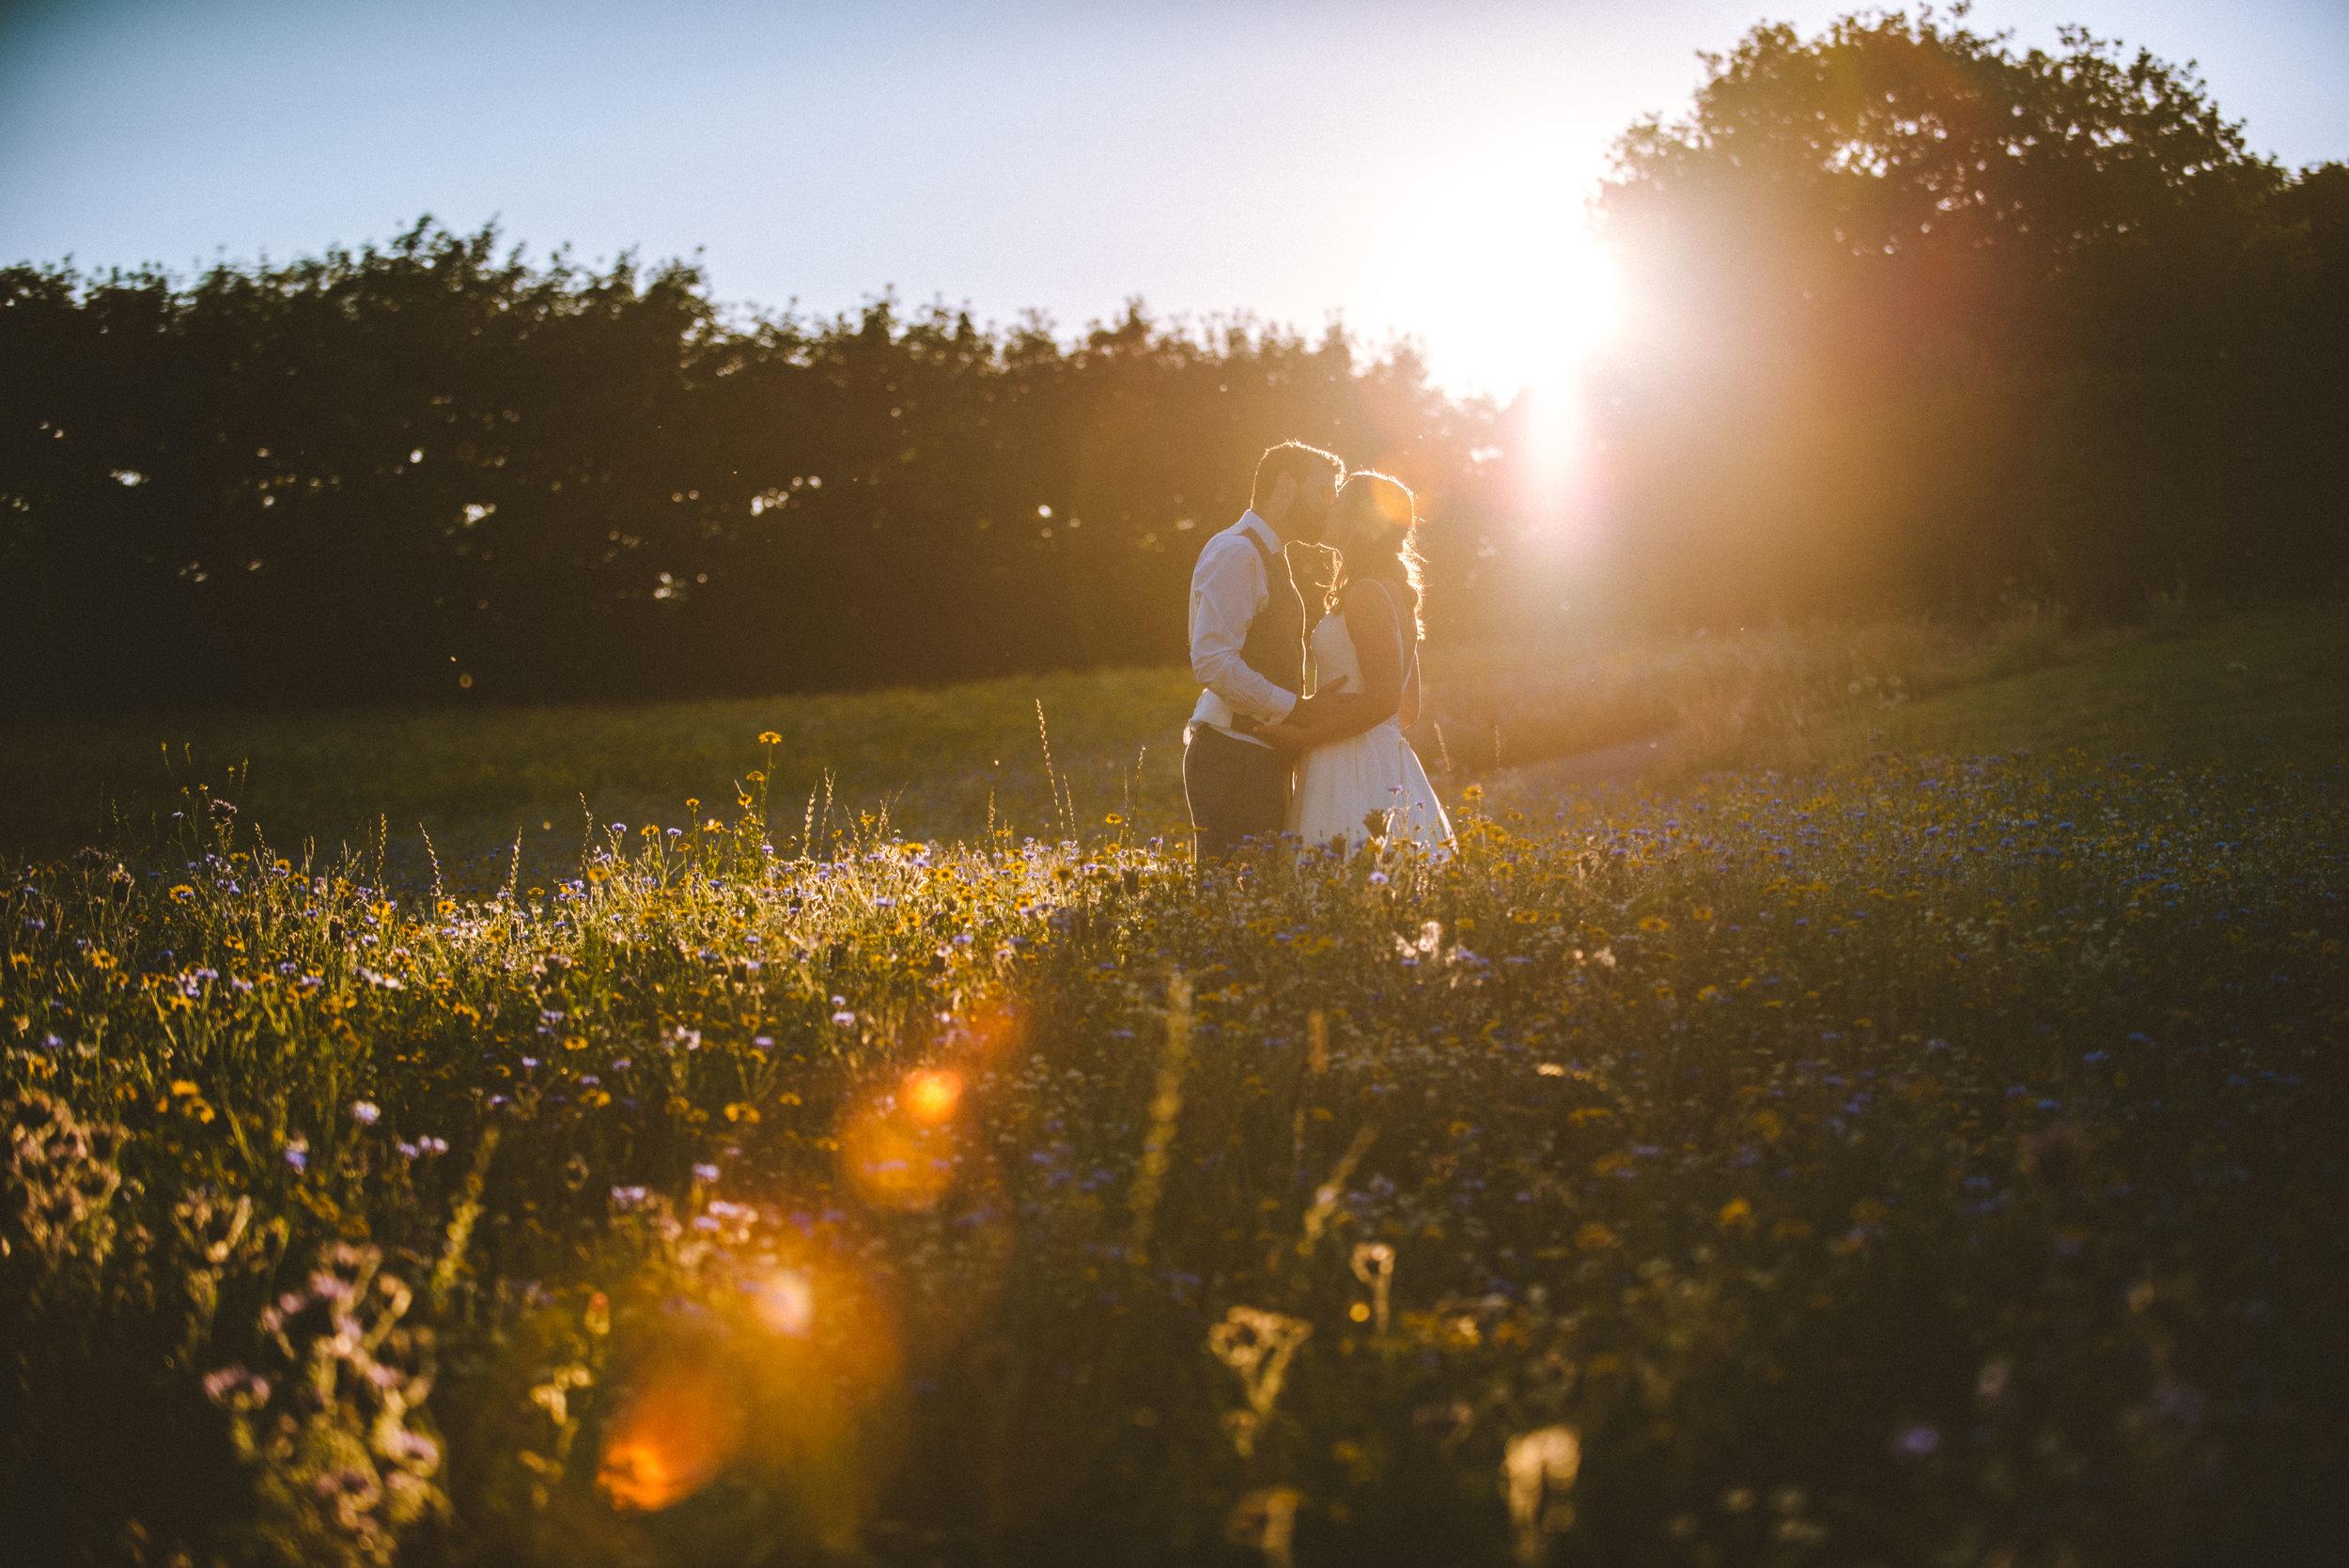 ashbarton-estate-wedding-photographer-mark-shaw-76.jpg